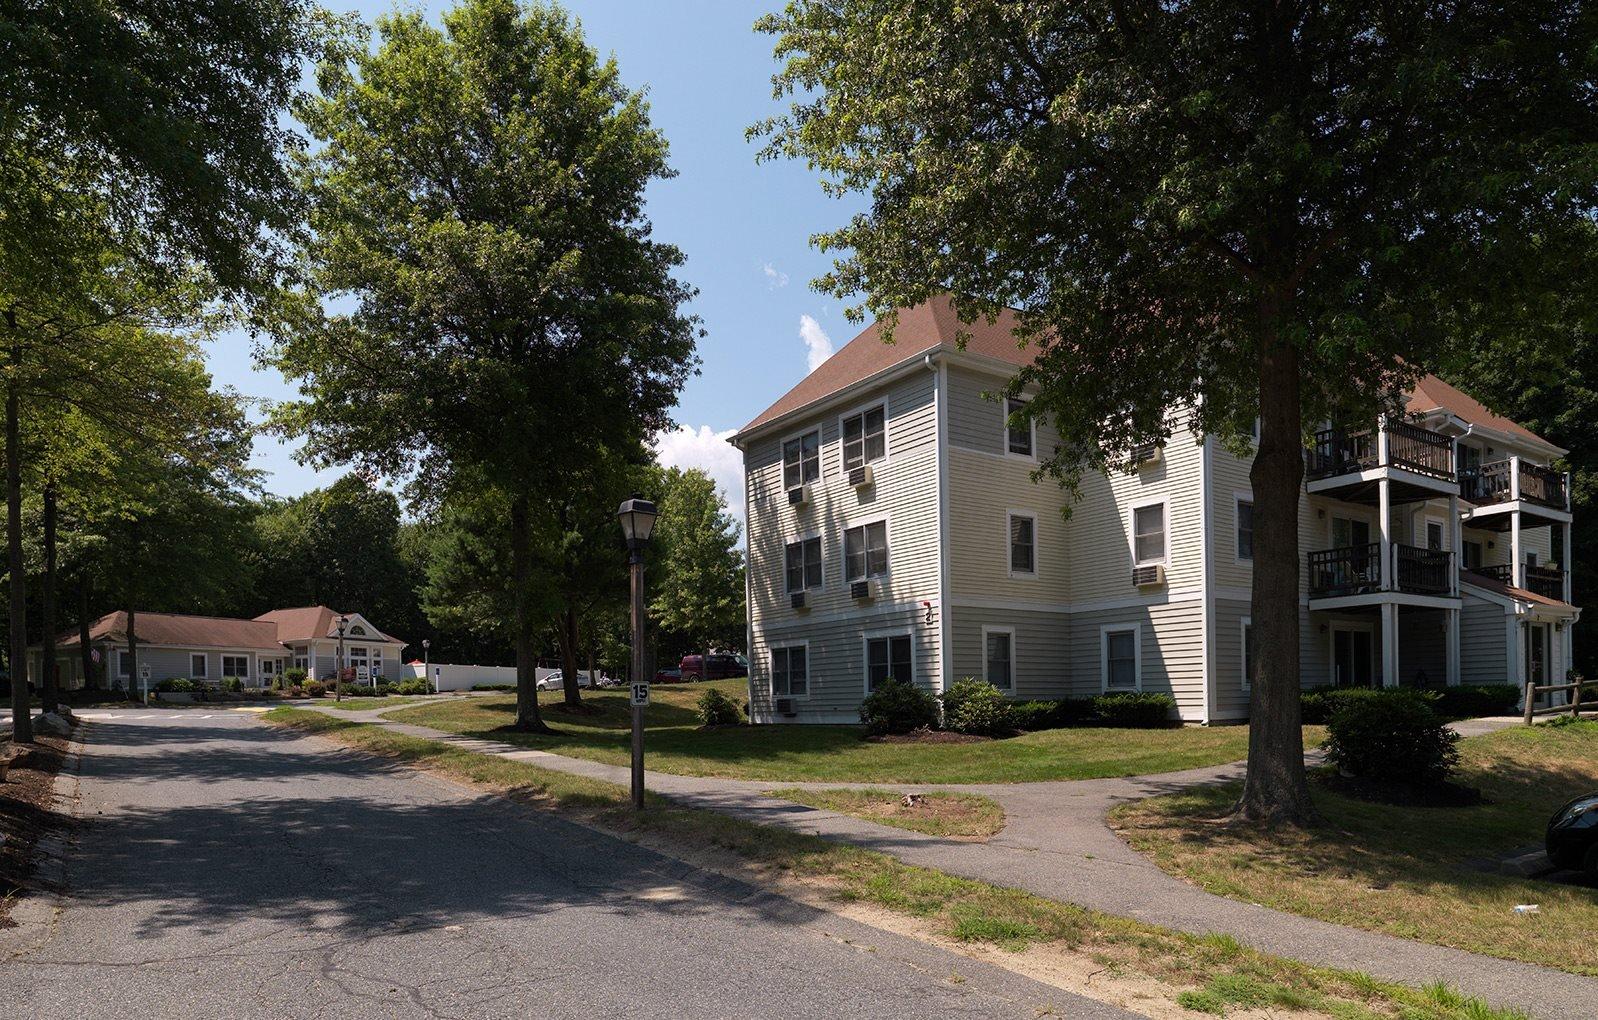 Littlebrook Apartments in Hudson, MA